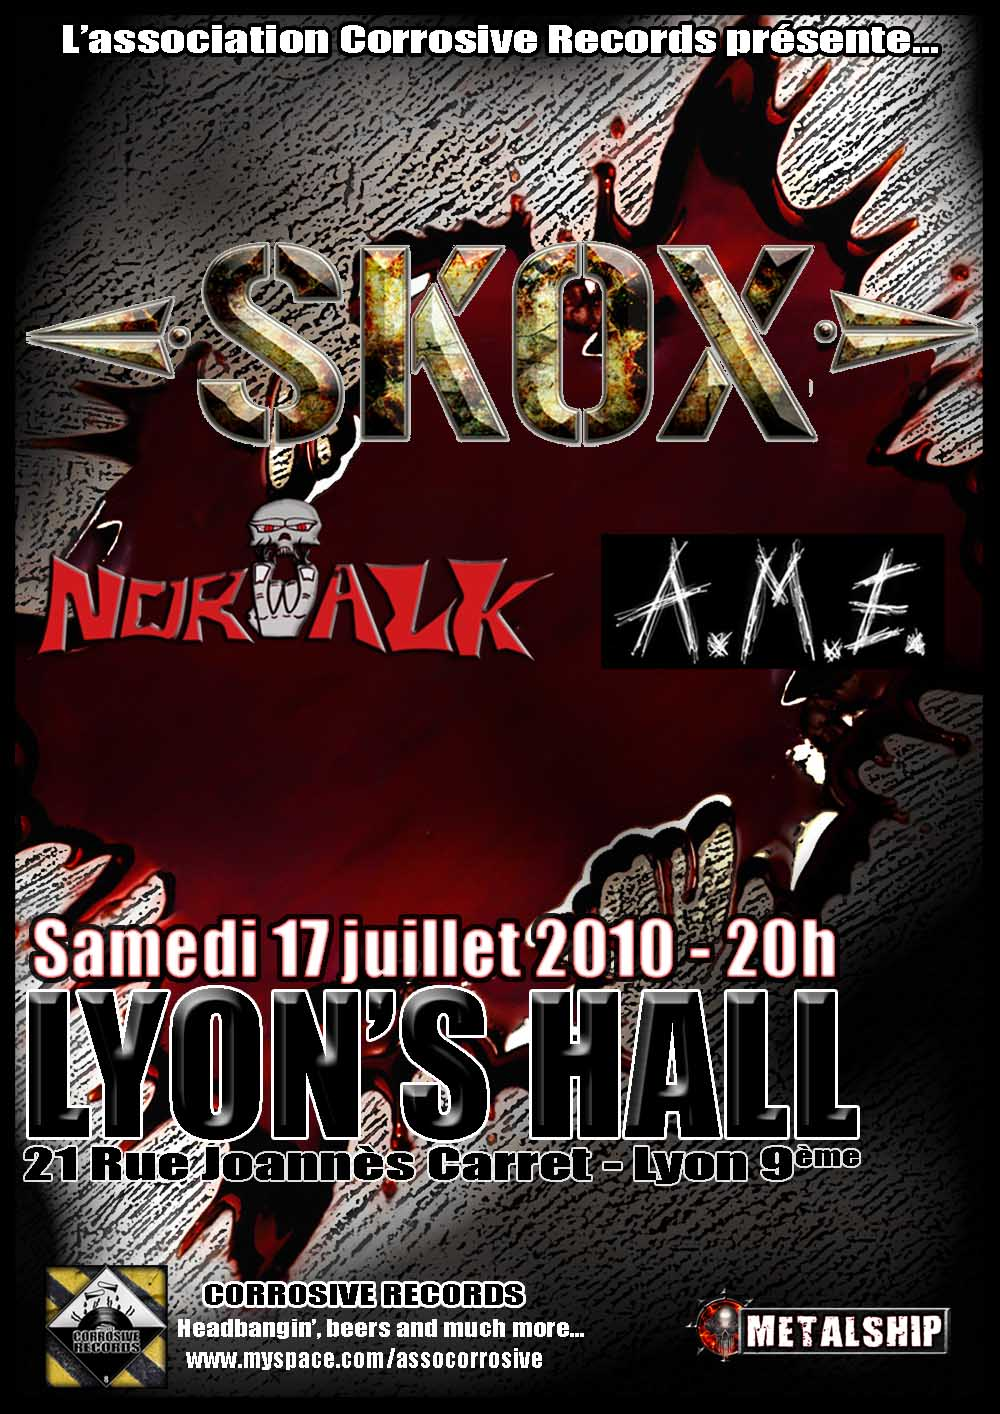 Skox @ Lyon